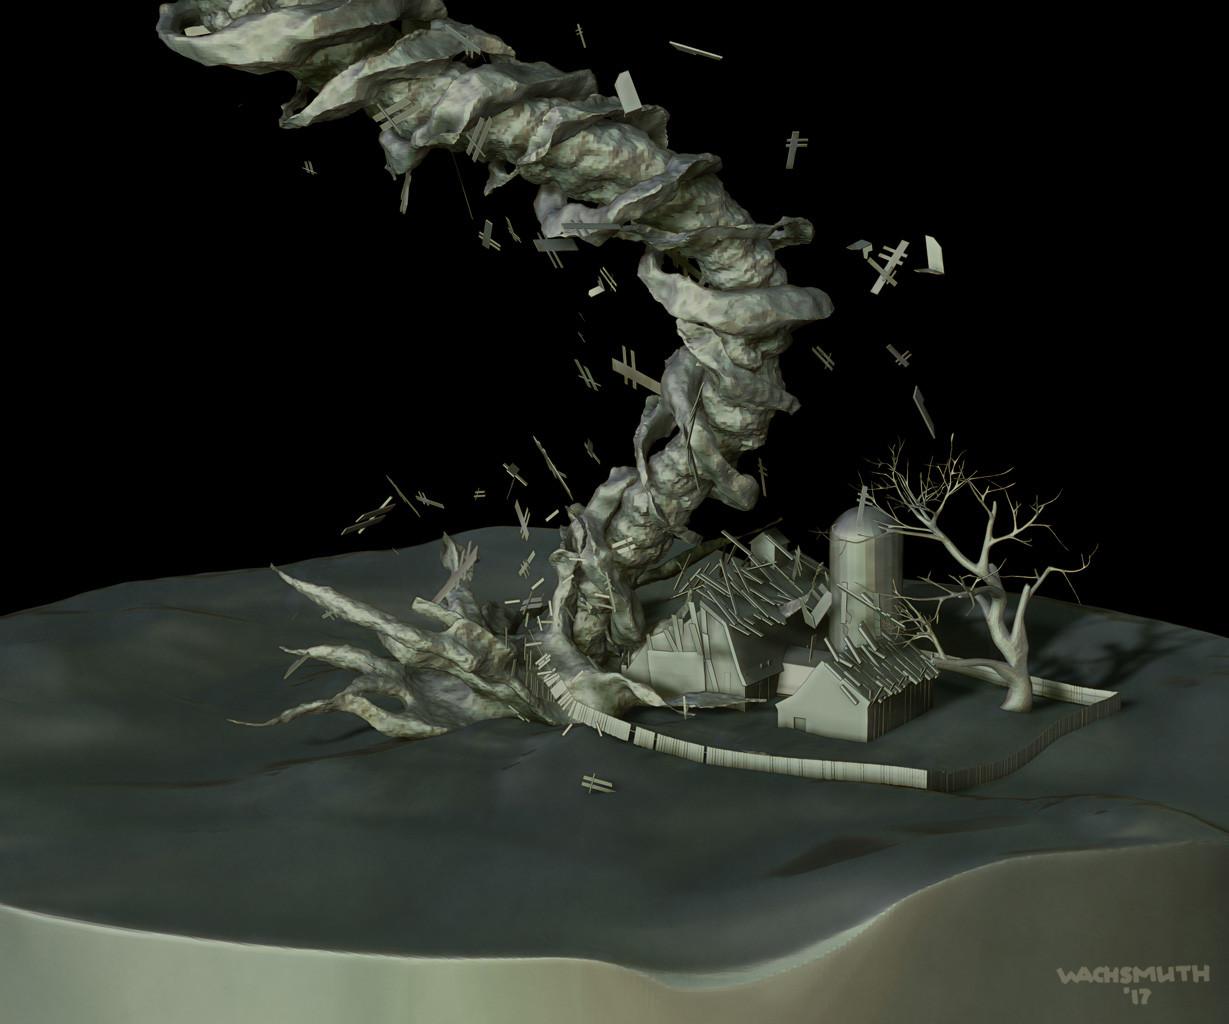 Dirk wachsmuth tornado view 05 4web